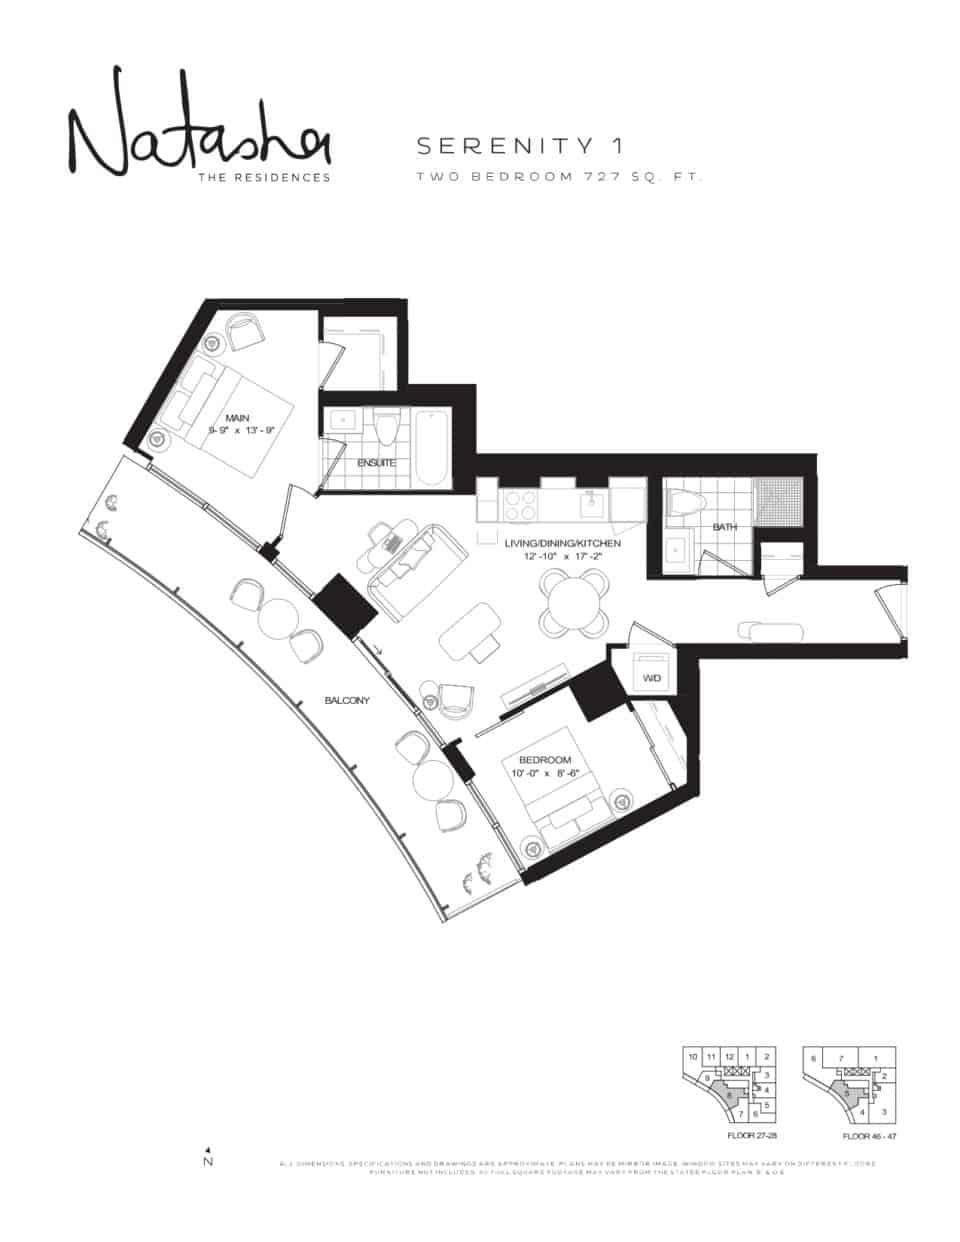 2021 09 02 11 03 07 natashatheresidences lanterradevelopments floorplans serenity1